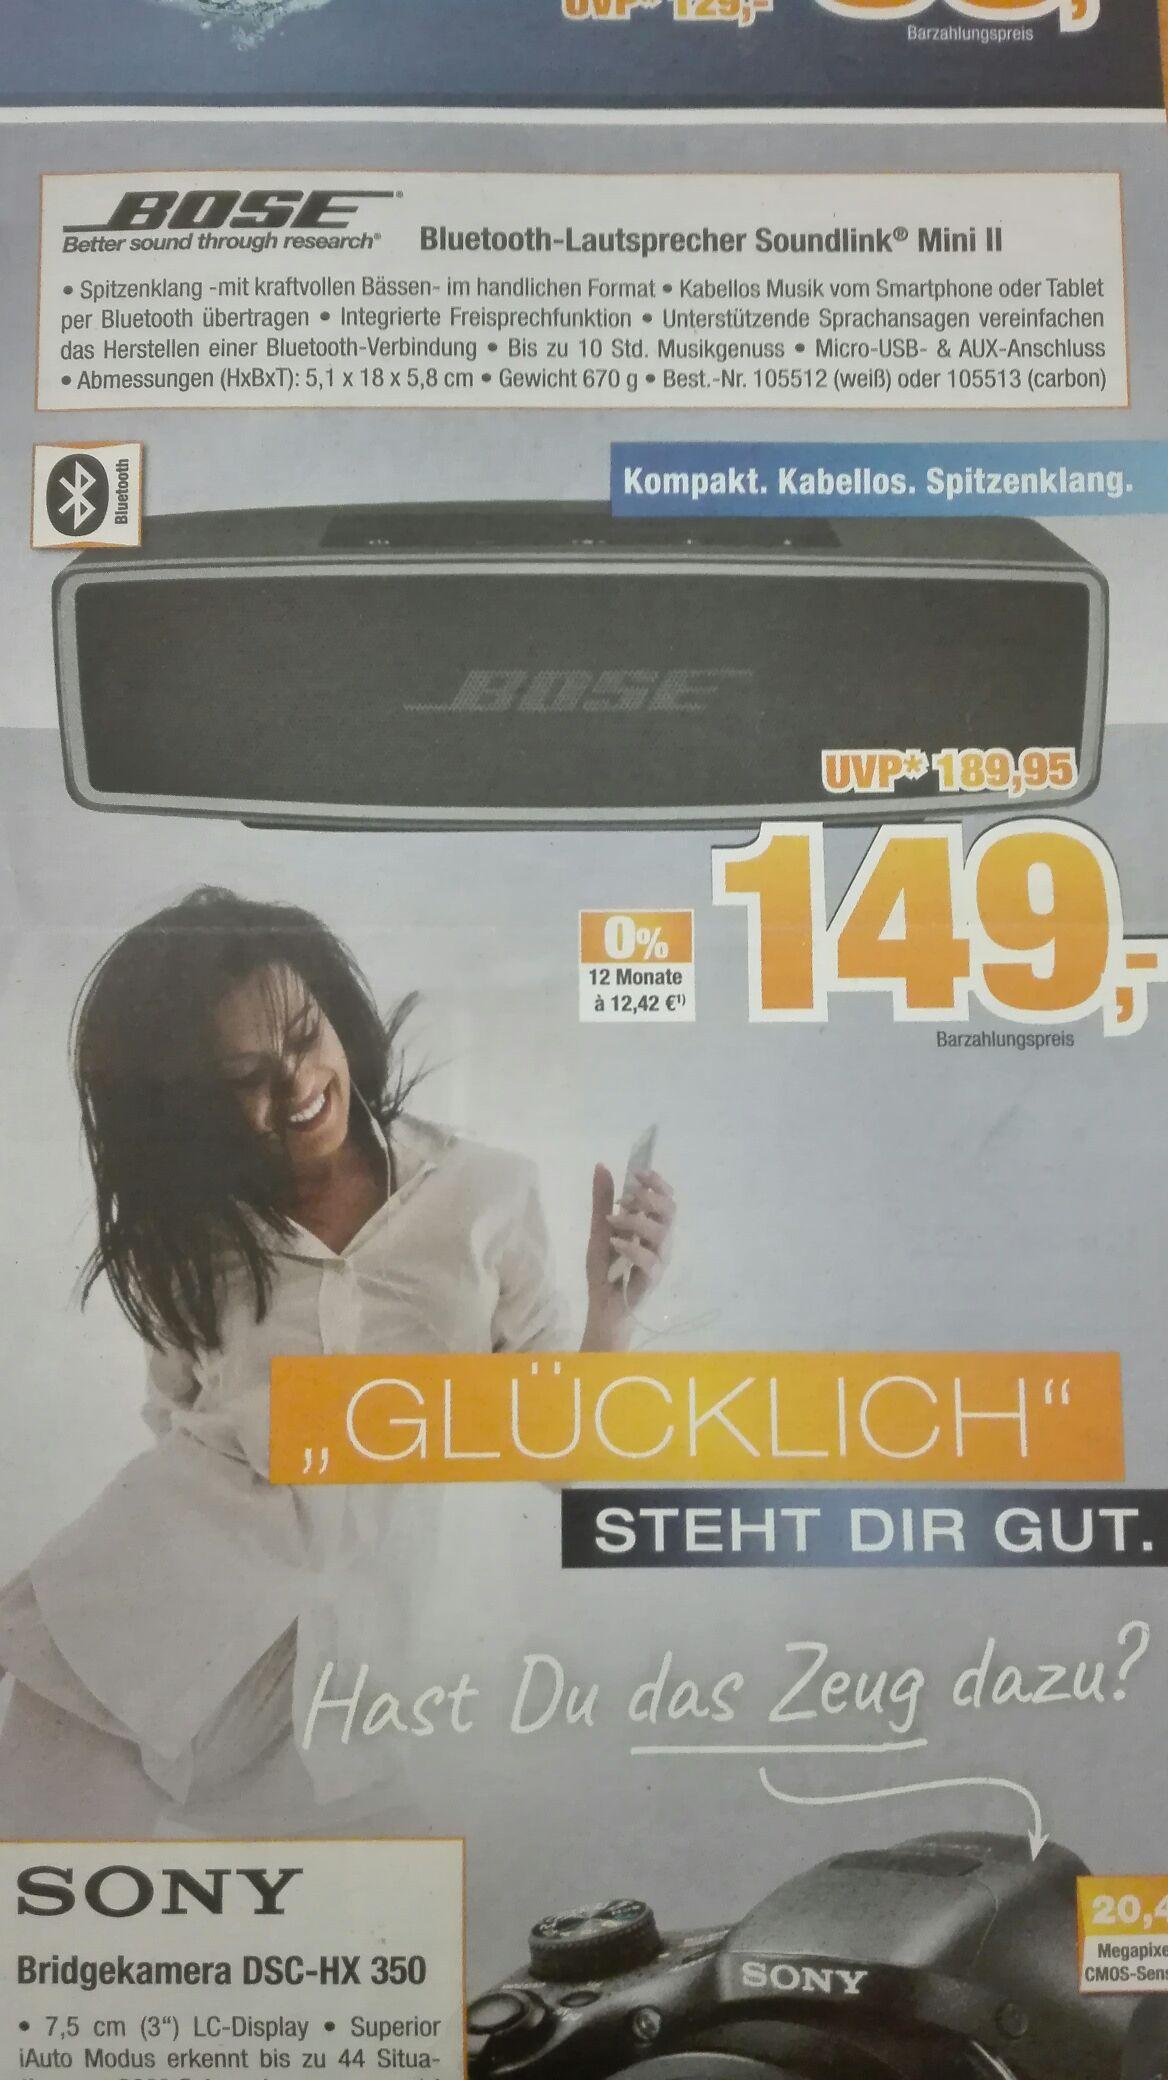 Expert Bening Bose Soundlink Mini II Bluetooth Lautsprecher